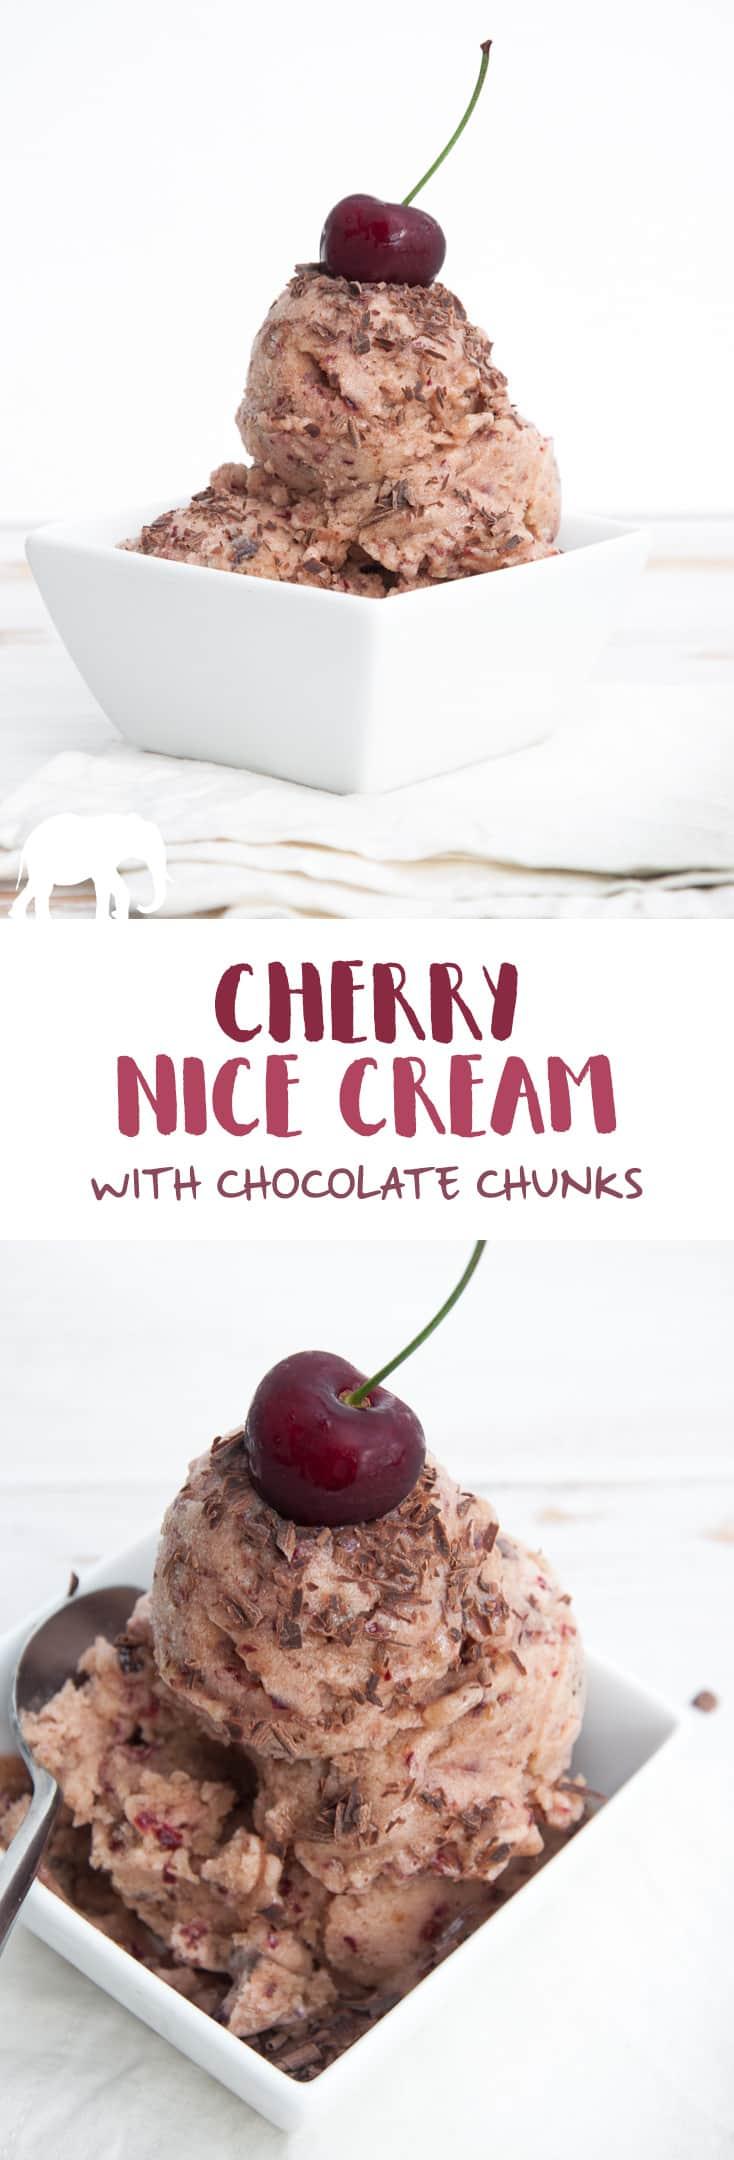 Cherry Nice Cream with Chocolate Chunks   Elephantastic Vegan